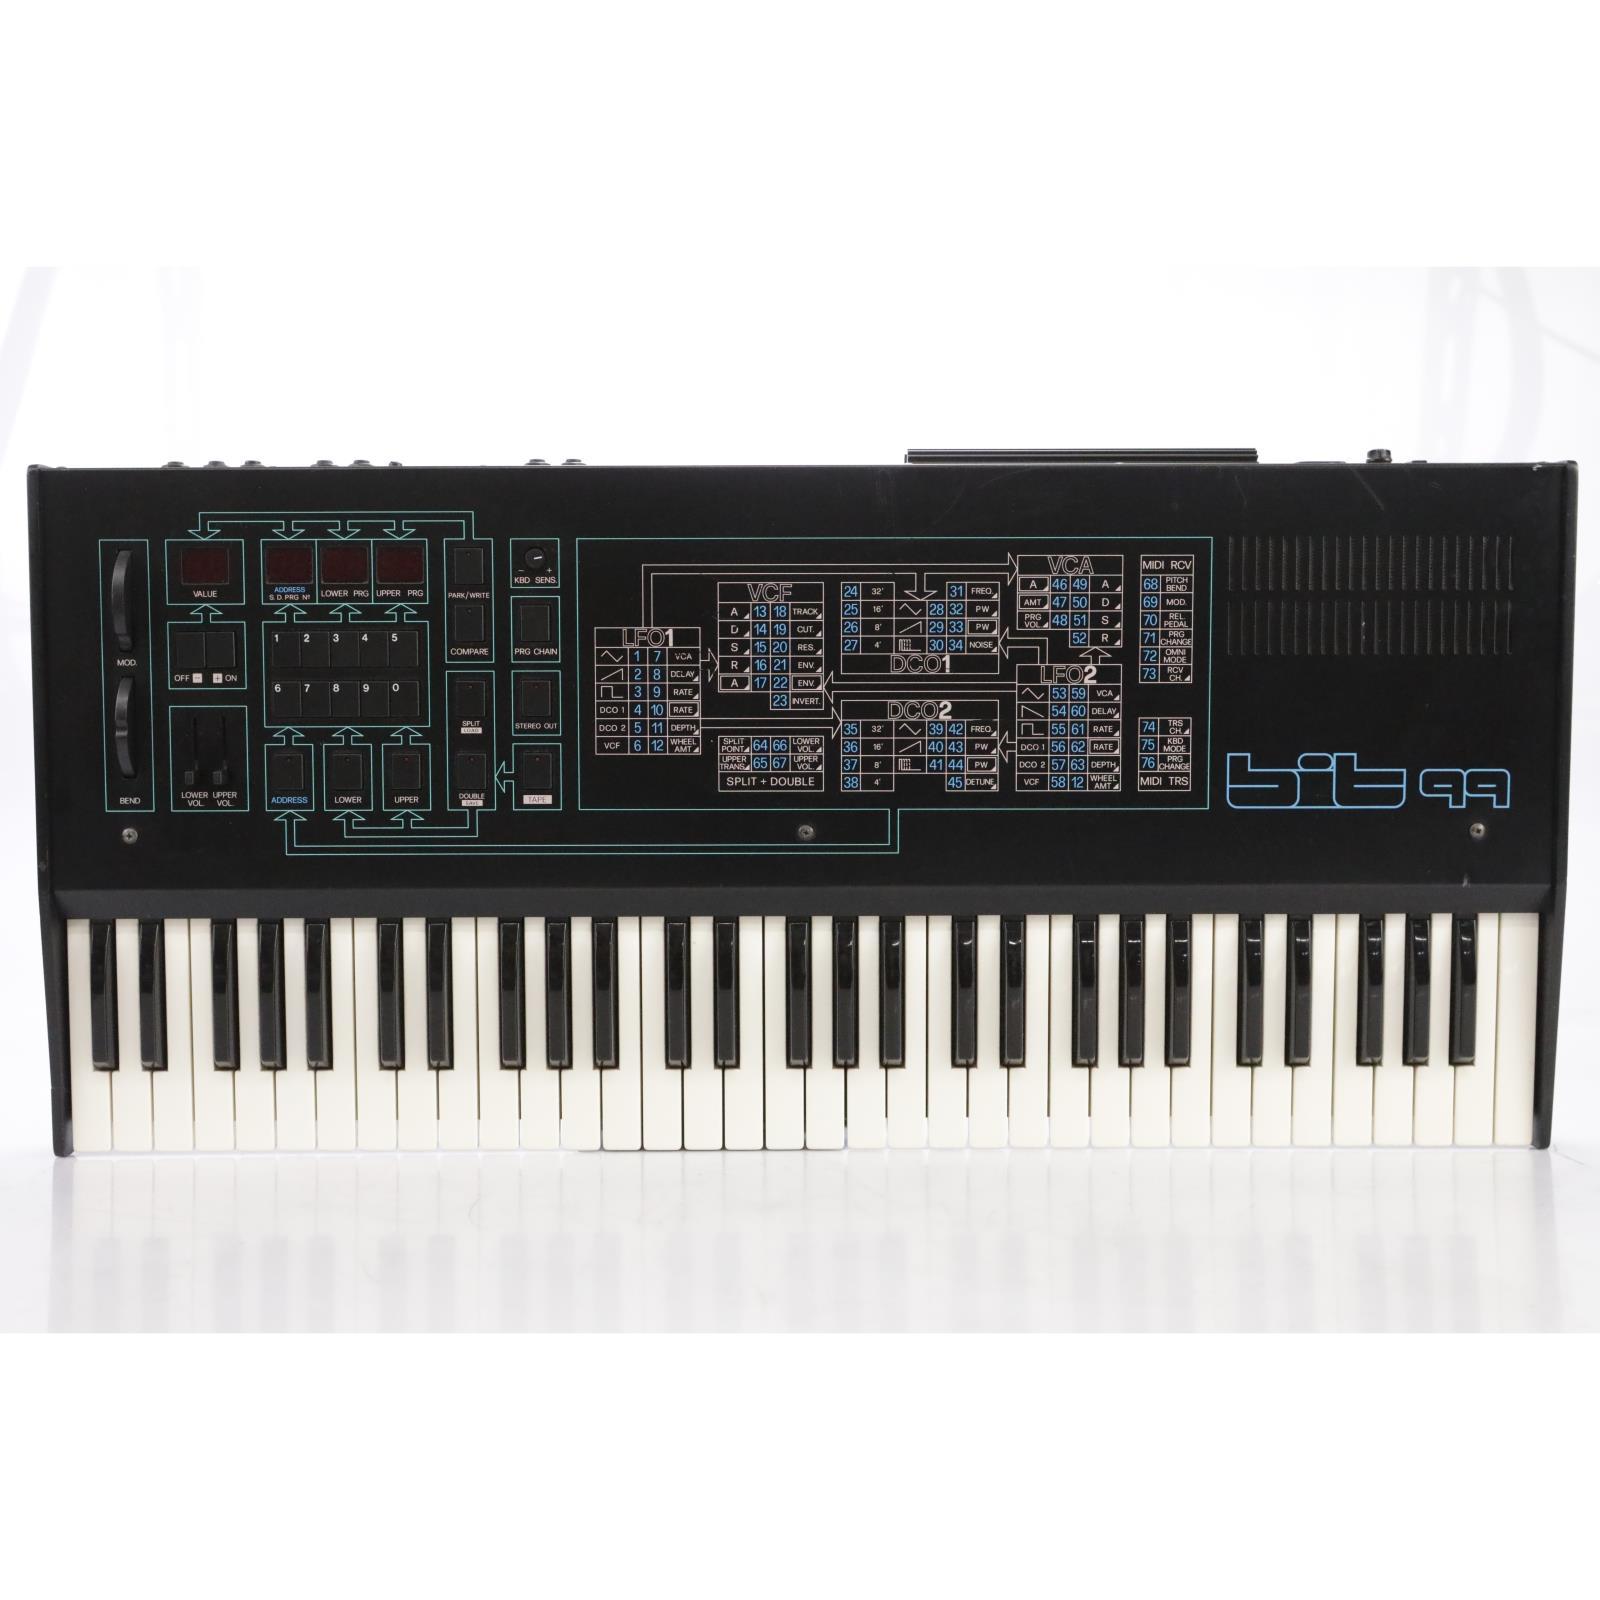 Crumar Bit99 61-Key Programmable Polyphonic Analog Synthesizer w/ Manual #44107